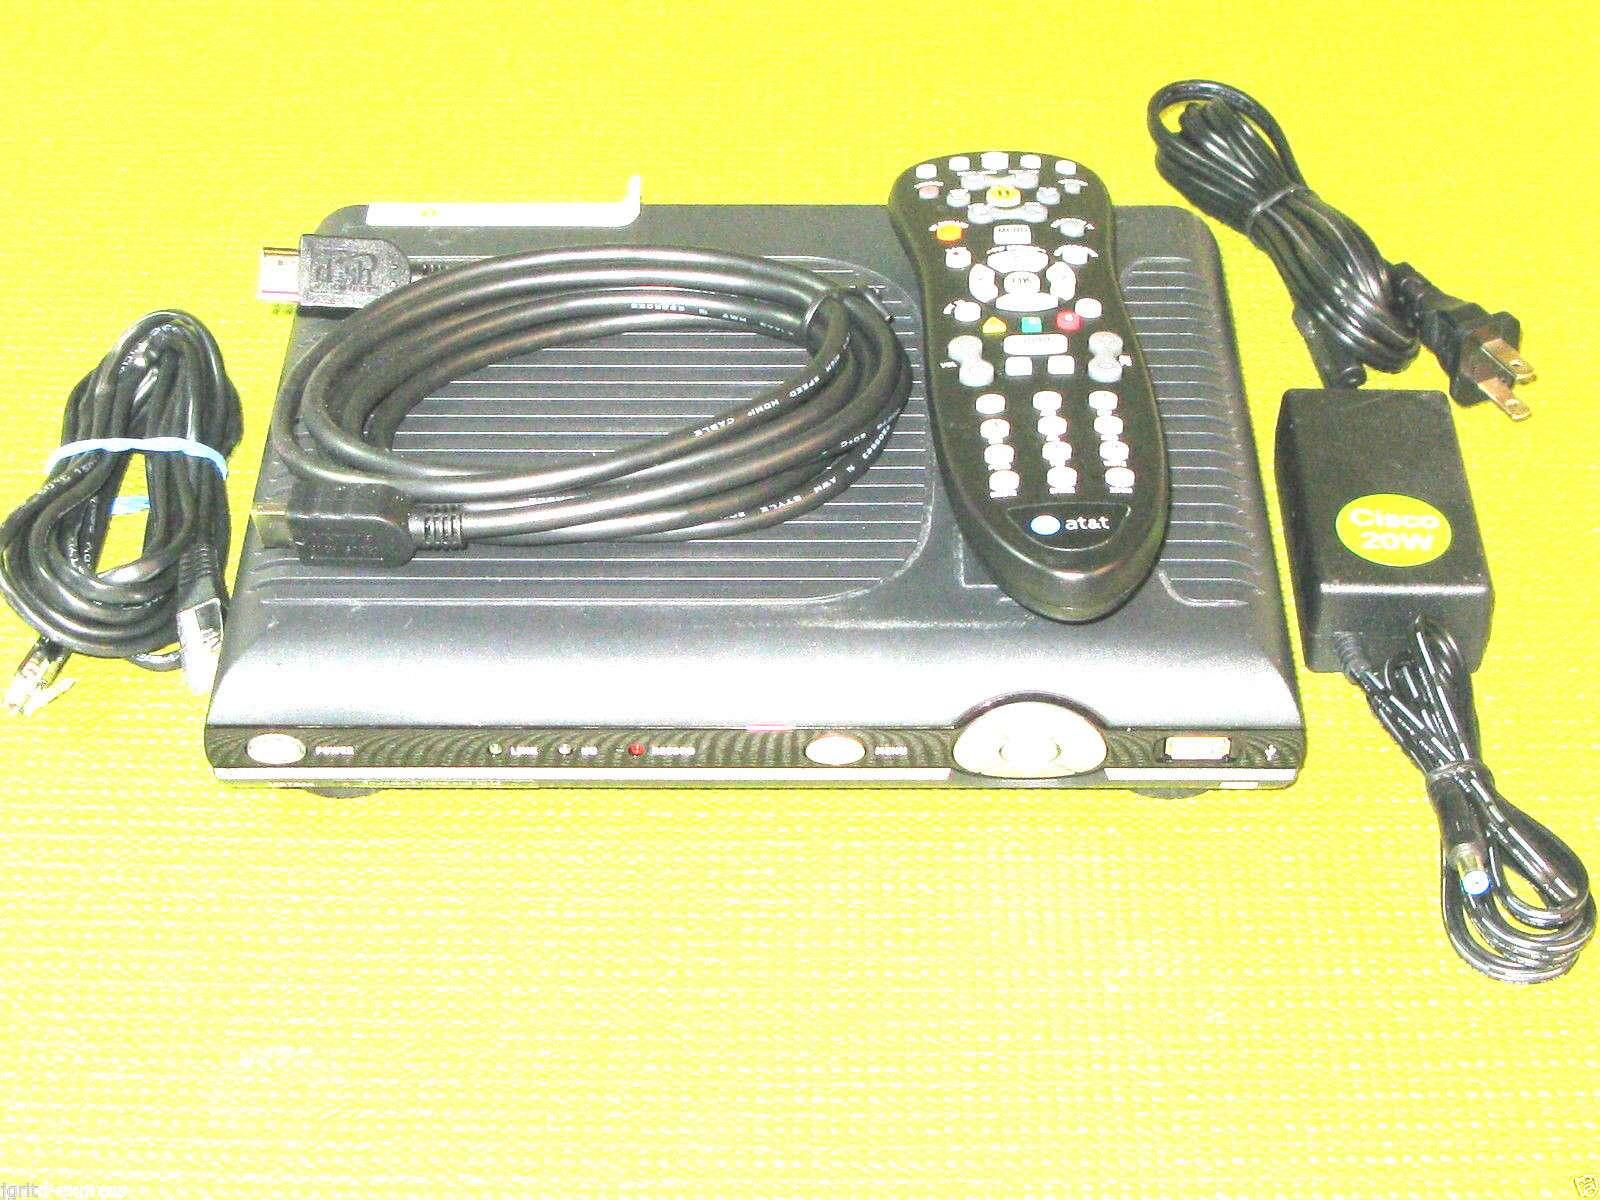 AT&T ISB 7005 U verse HDMI USB Cisco receiver TV internet WIFI cable att  ISB7005